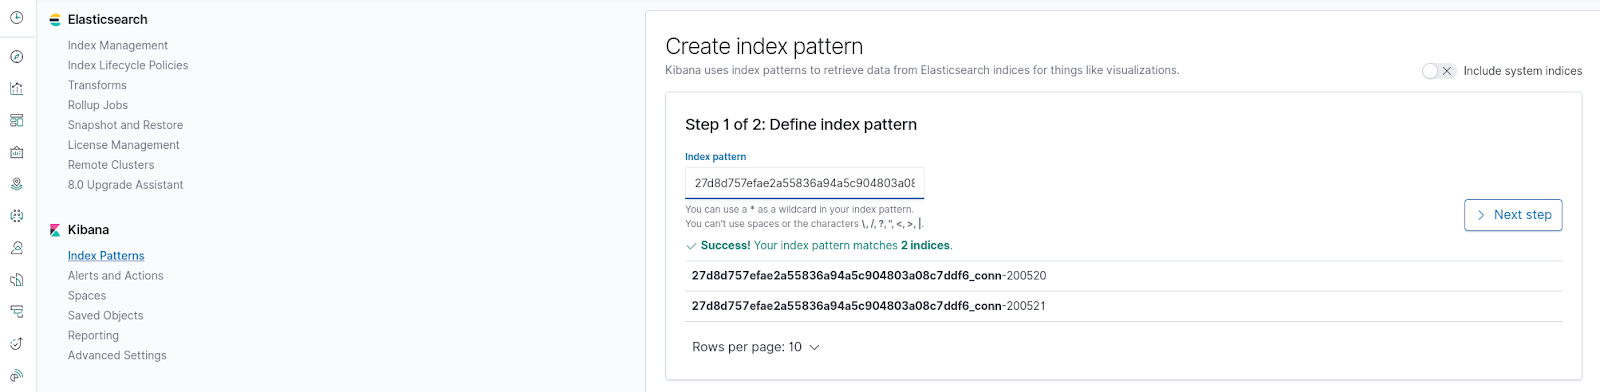 Create Index Pattern